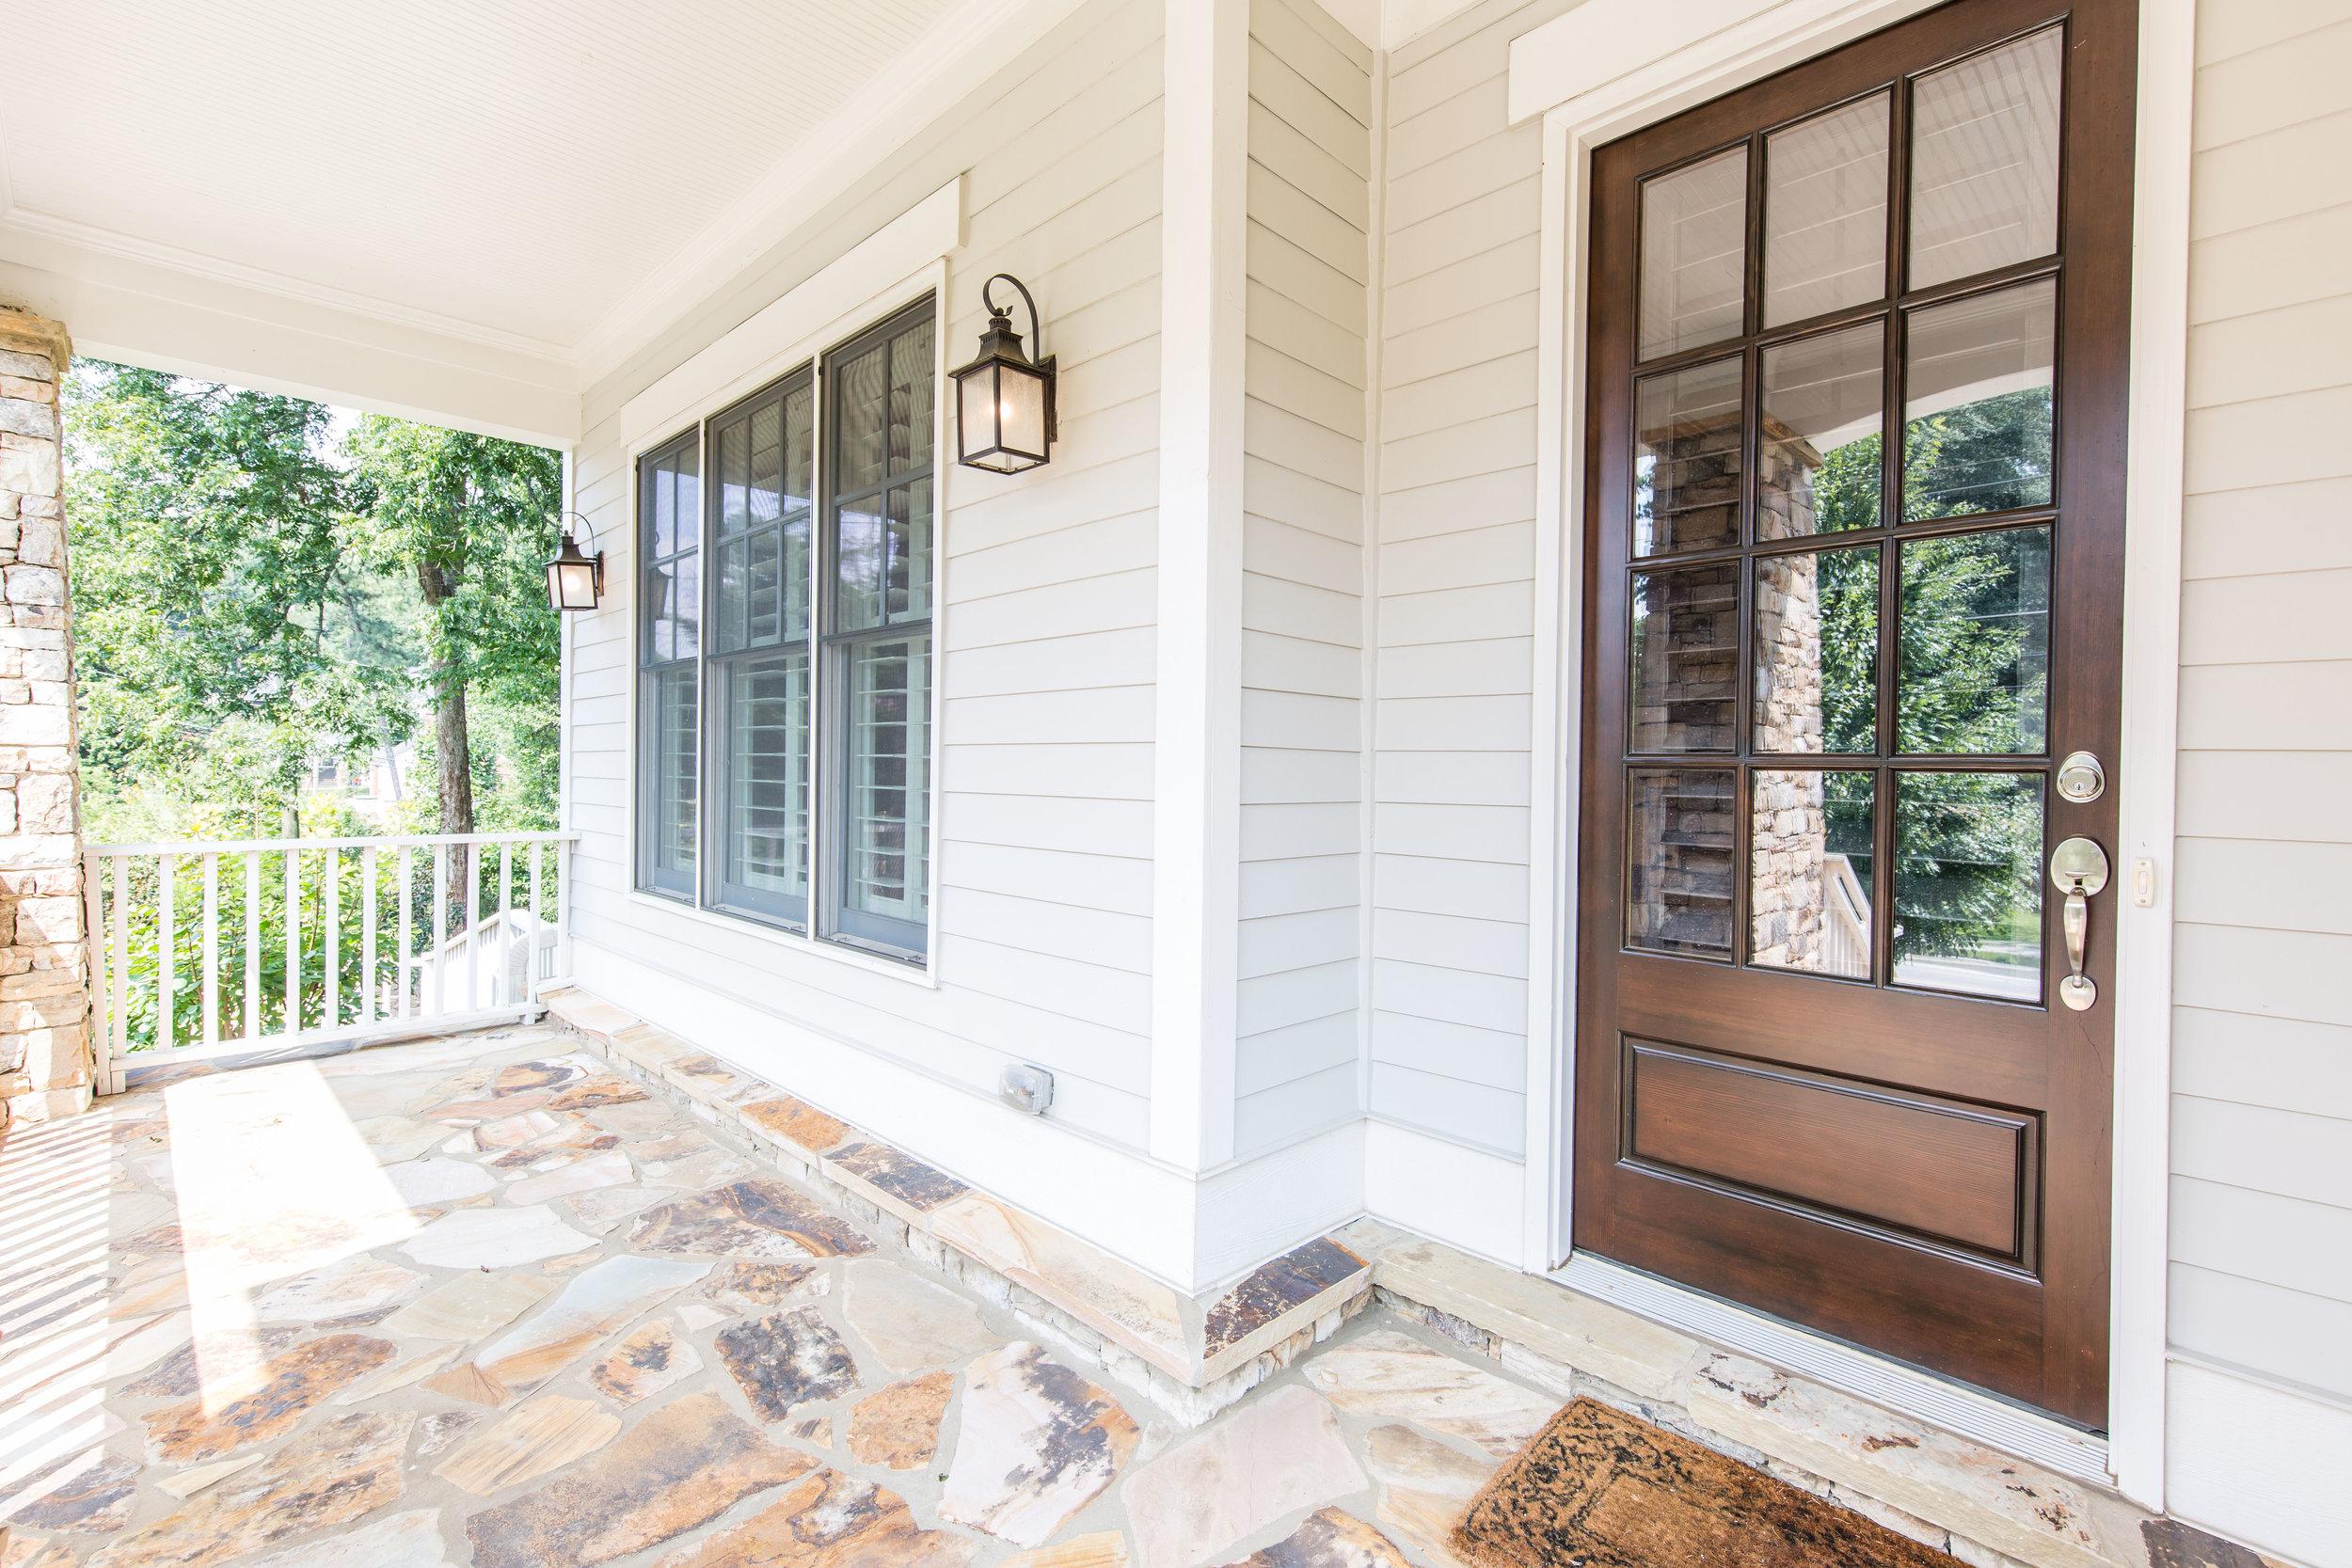 900 S Candler-Front Porch.jpg